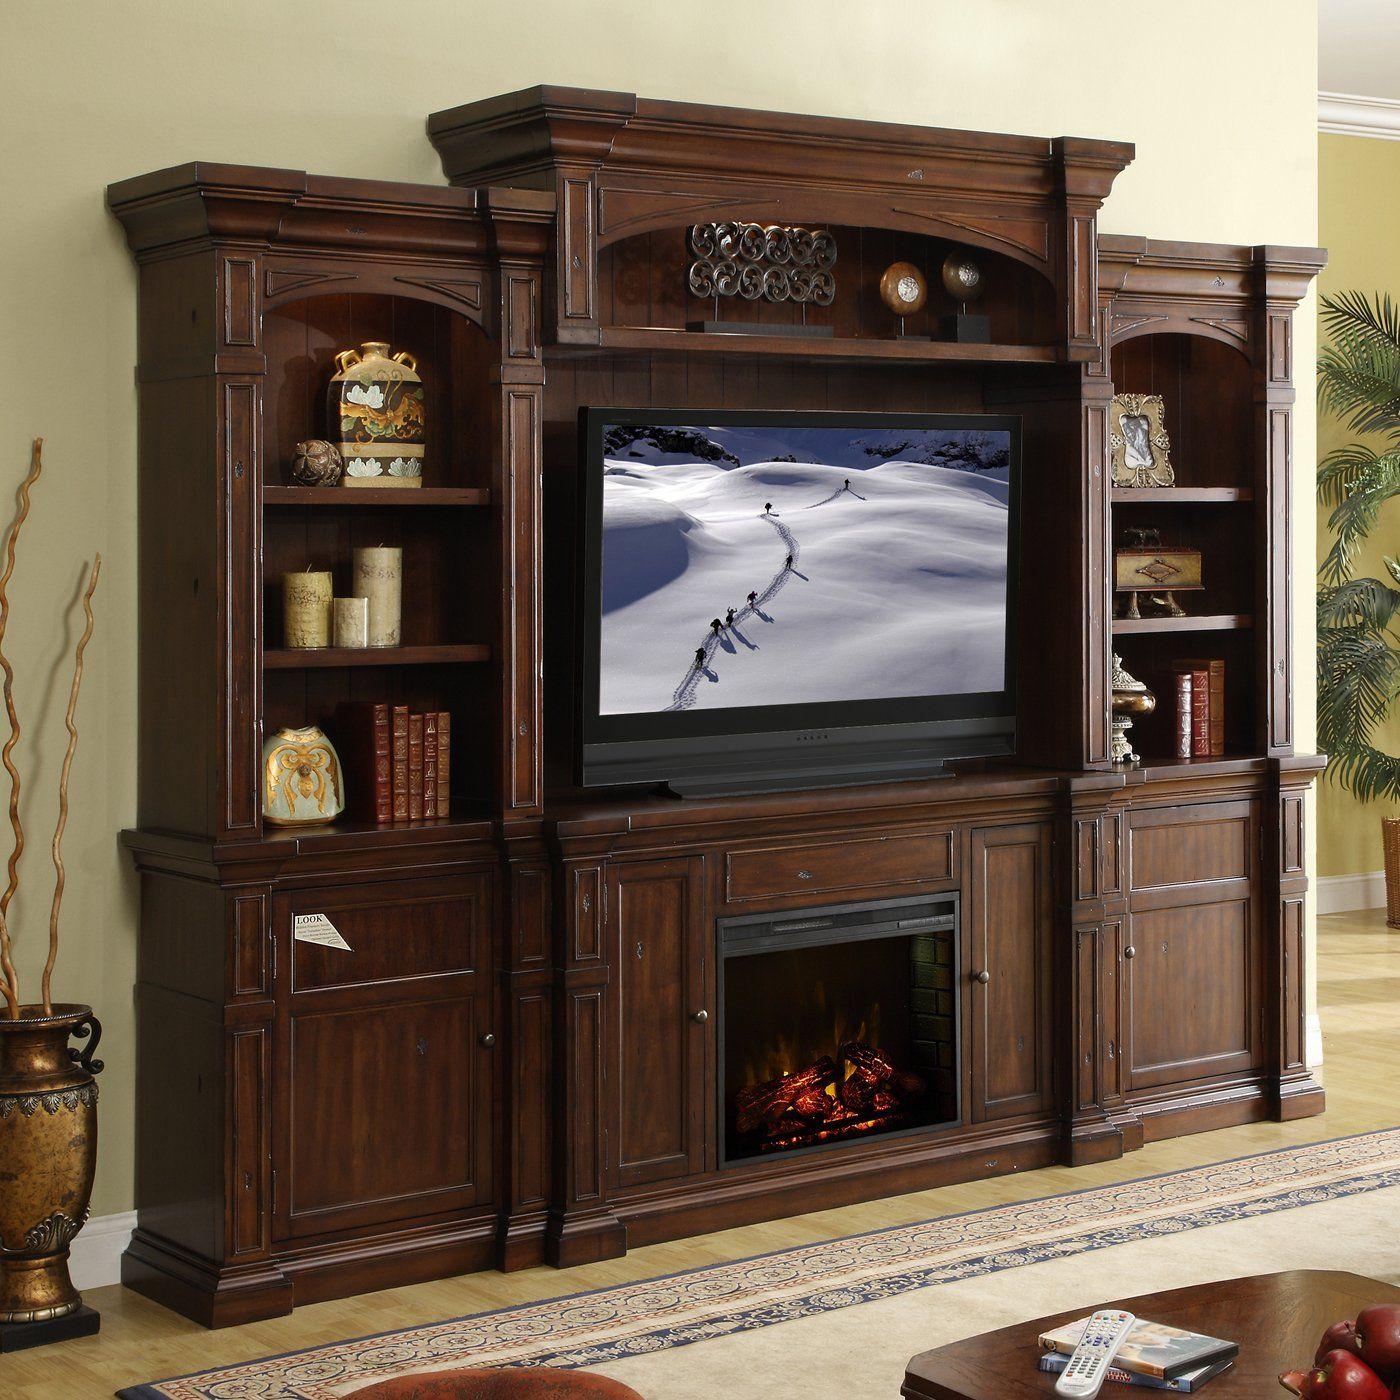 Legends Furniture 4 piece Berkshire Fireplace